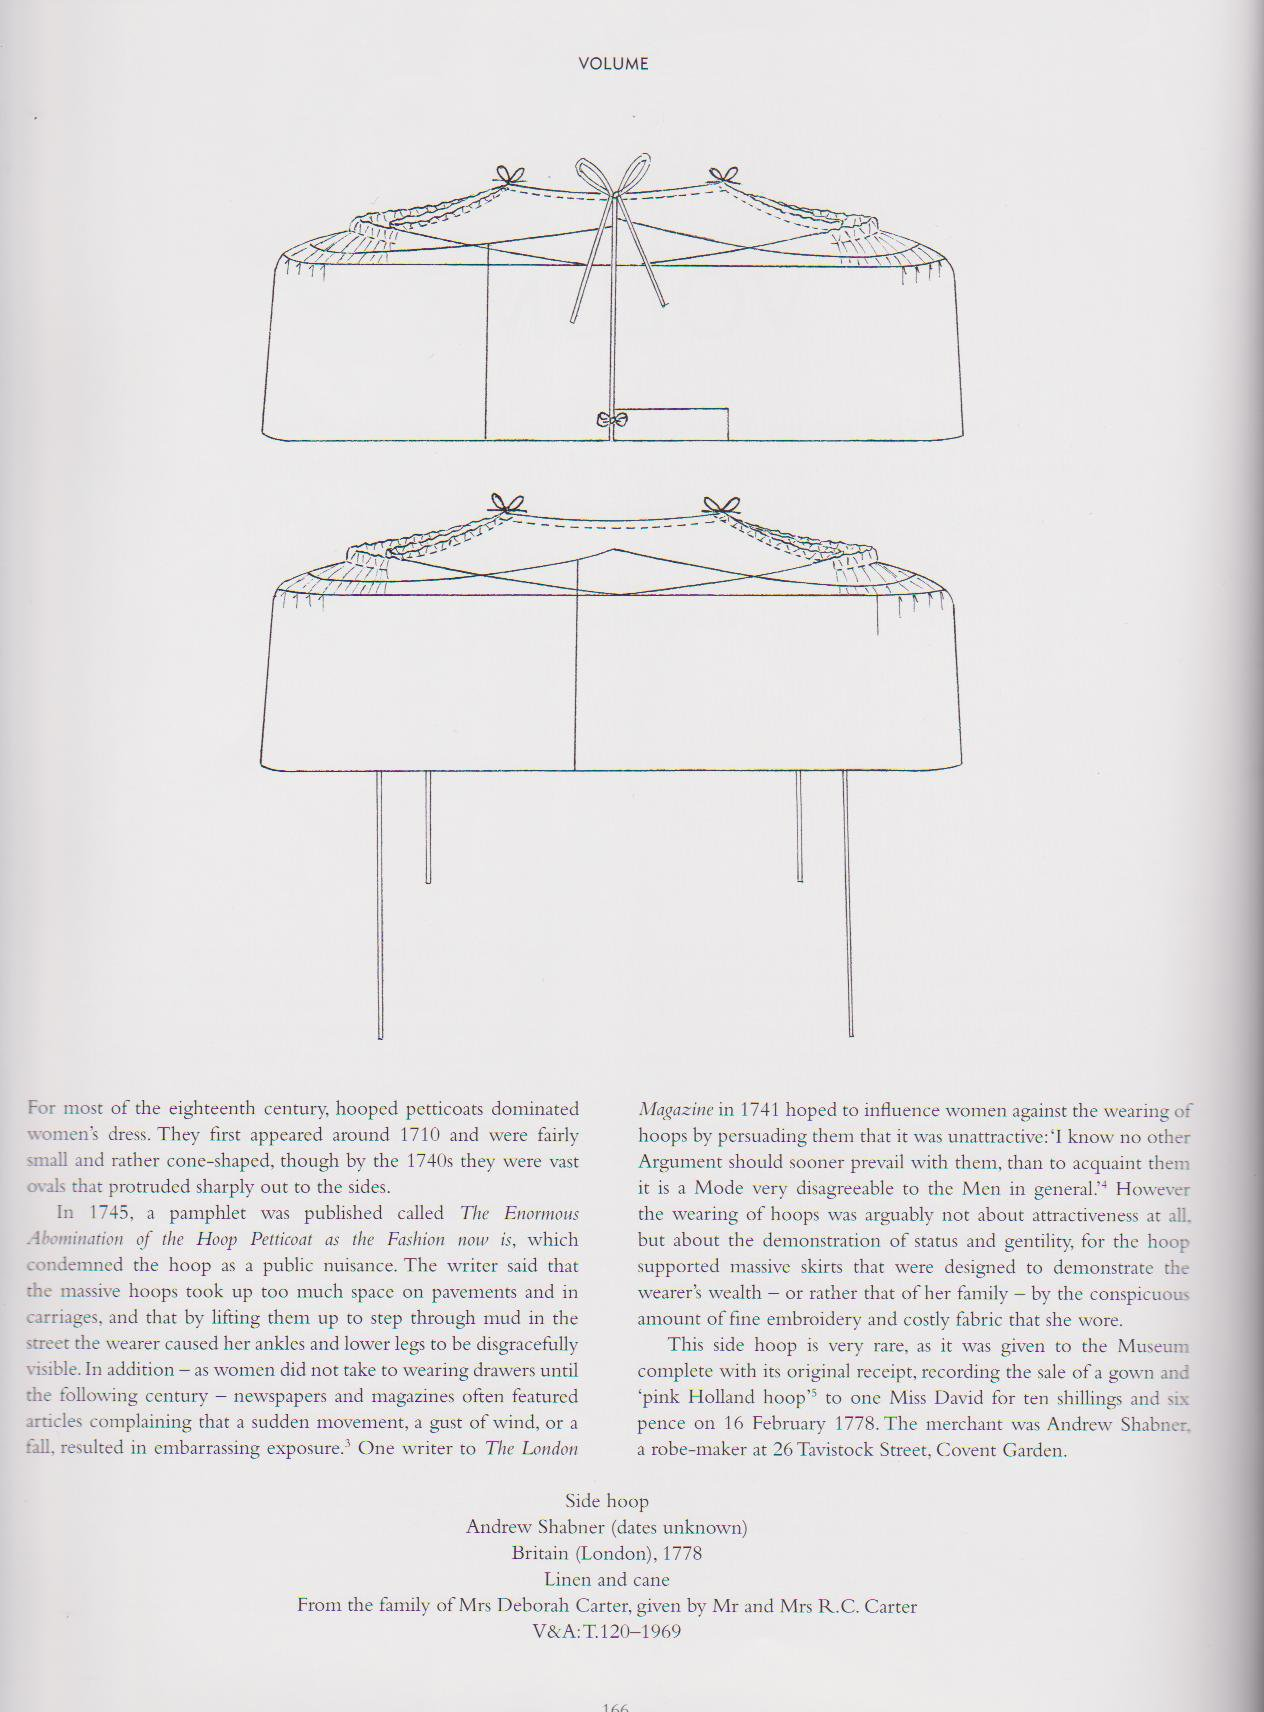 V&A Underwear - Eleri Lyn - Inner Page 1 - HandBound Costumes Bibliography